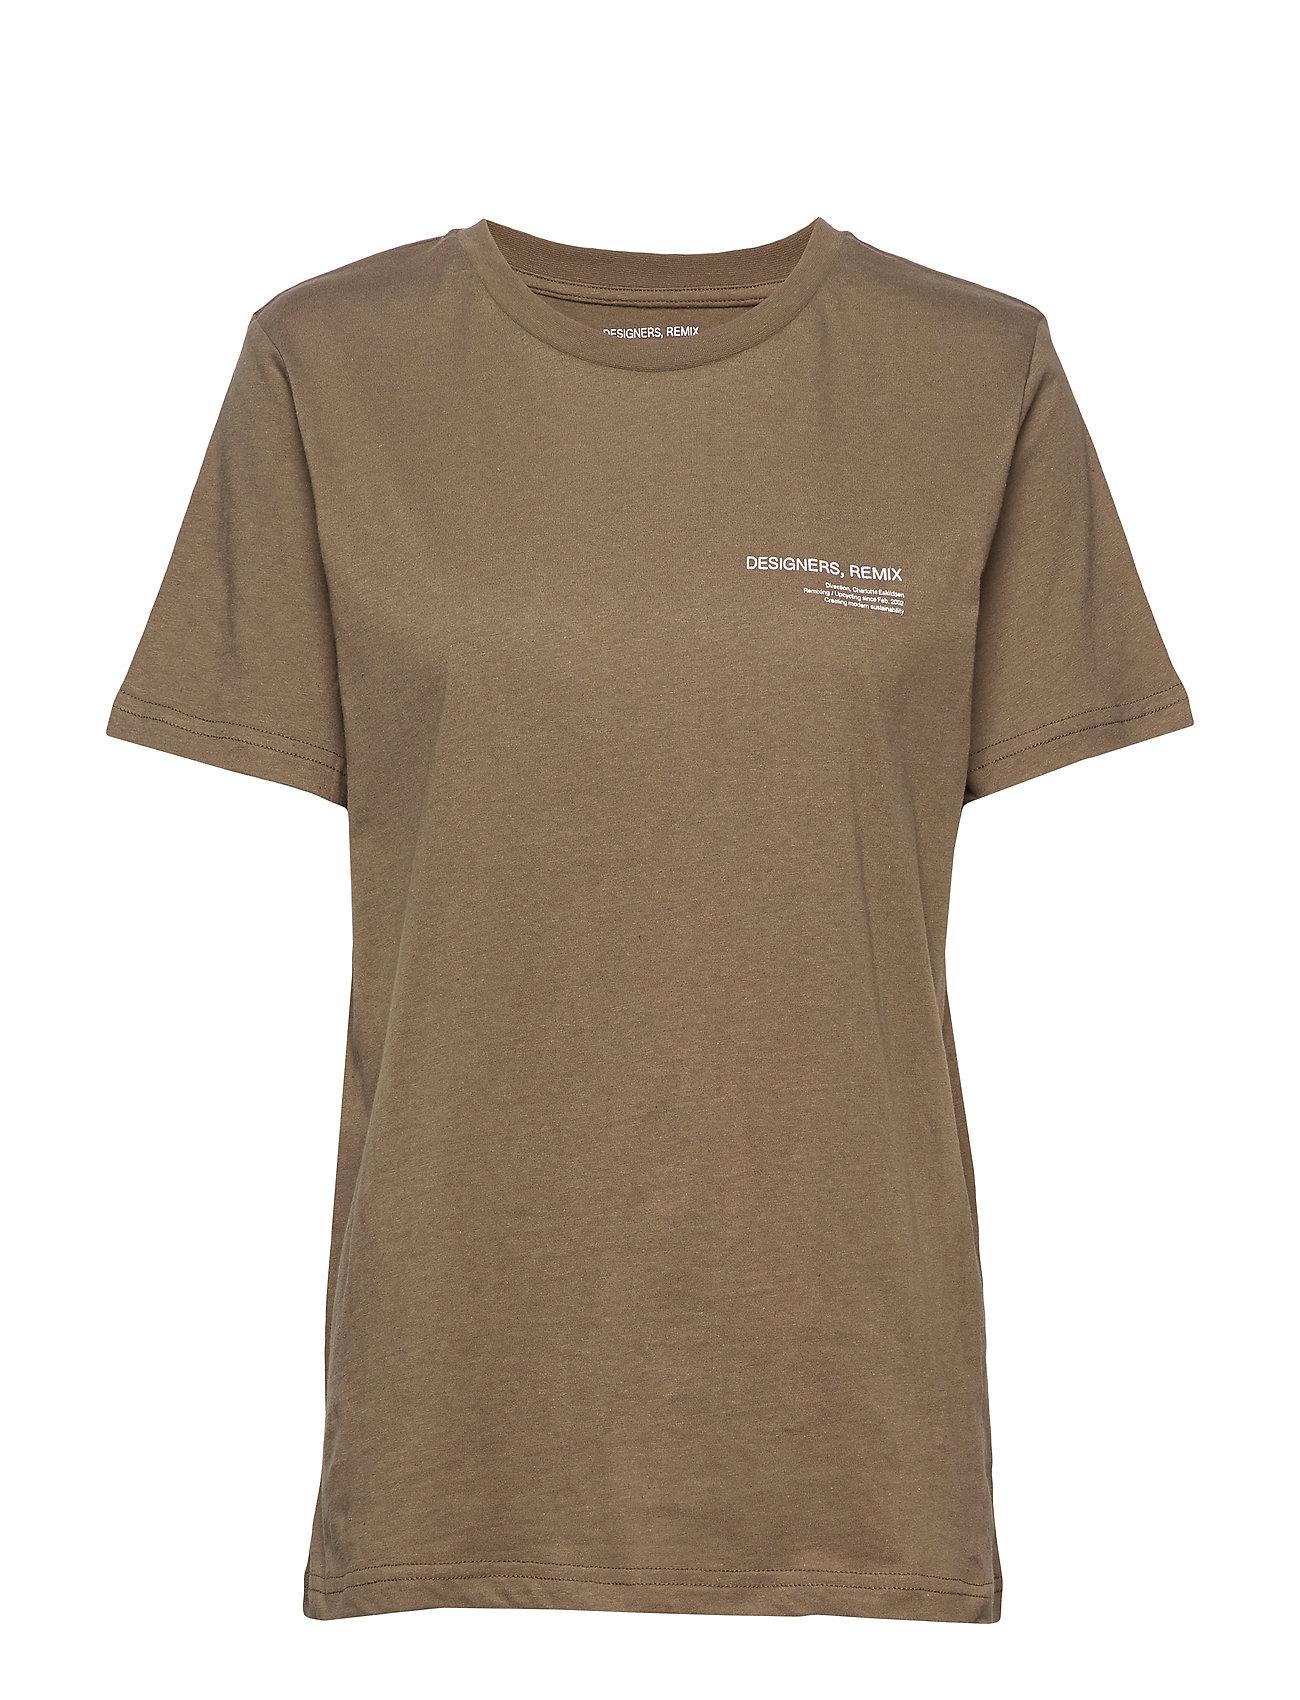 Image of Logo Printed Jersey T-Shirt T-shirt Top Brun DESIGNERS, REMIX (3305106269)